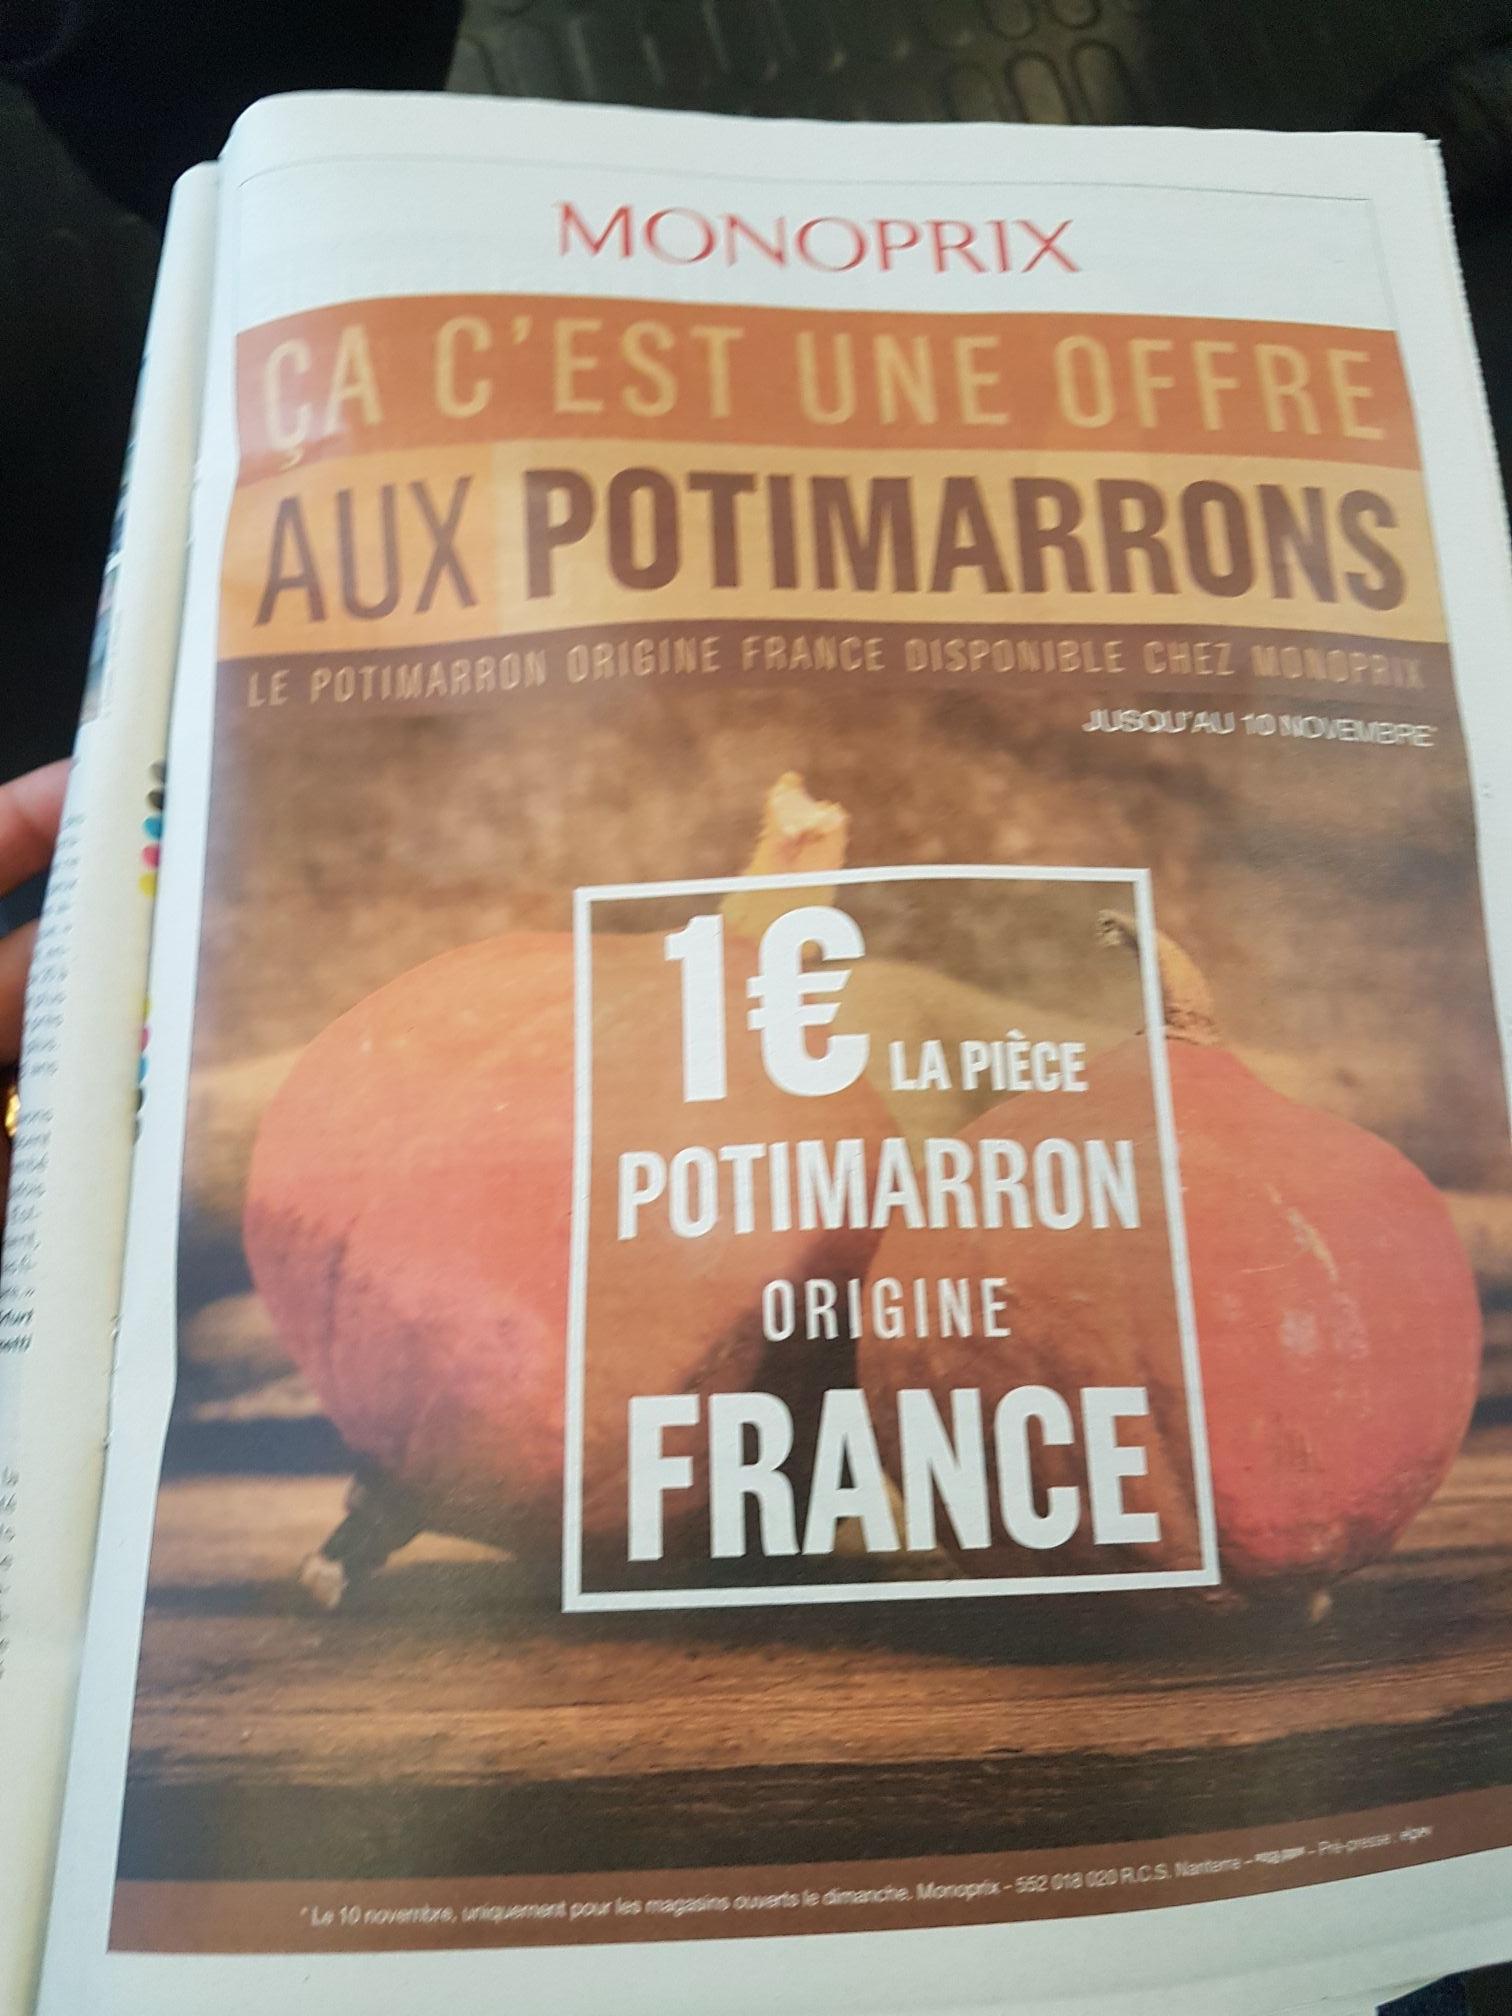 Potimarron - Origine France